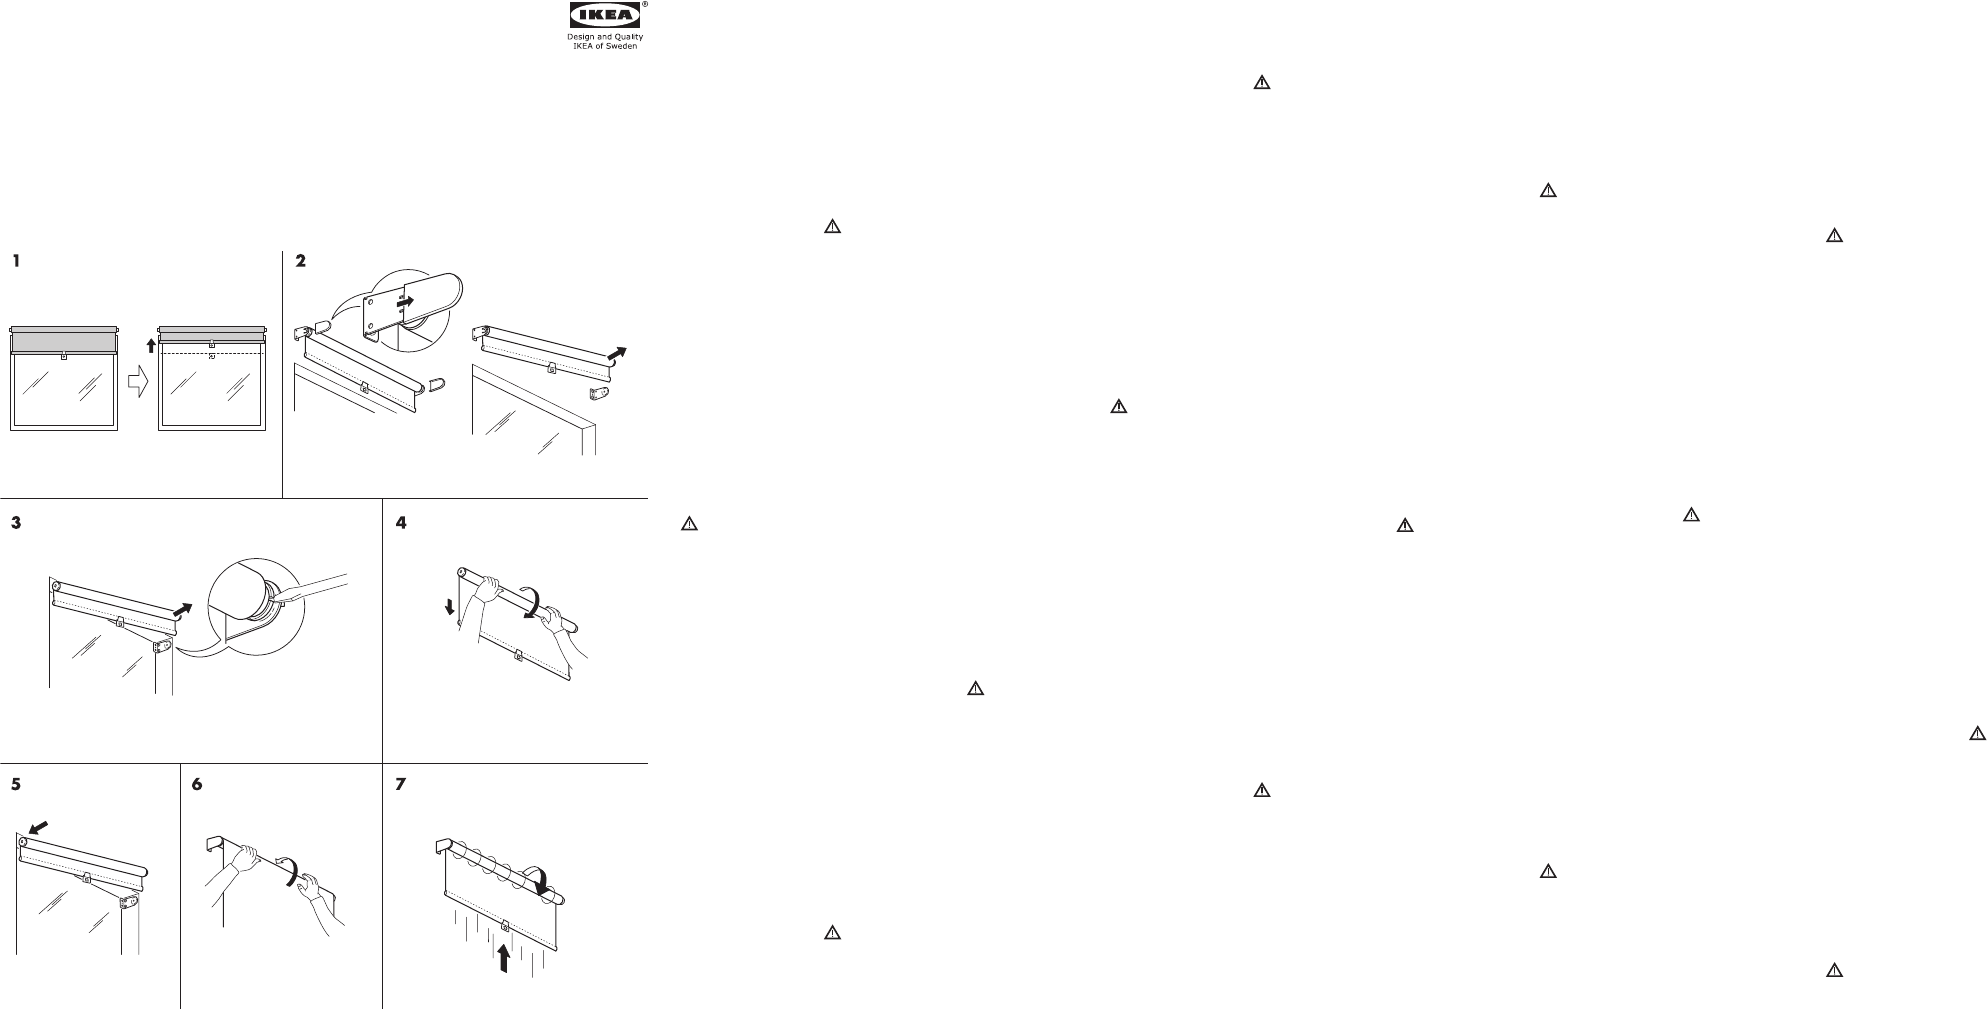 Anleitung Ikea Tupplur Rollo Ikea Produkte Rollos Anleitungen